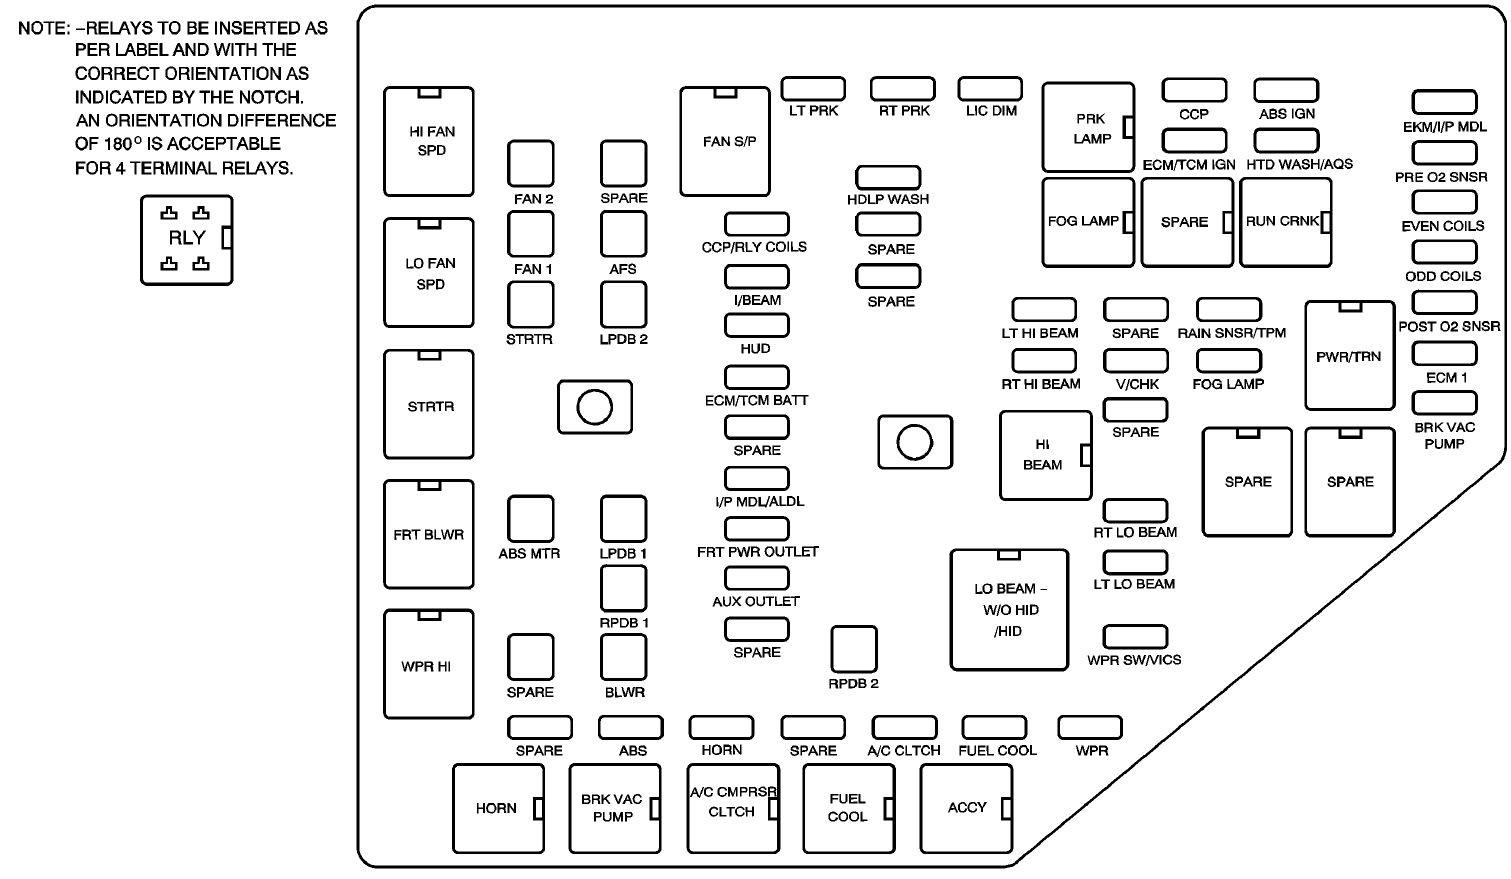 2008 Jetta Fuse Panel Diagram - All Diagram Schematics